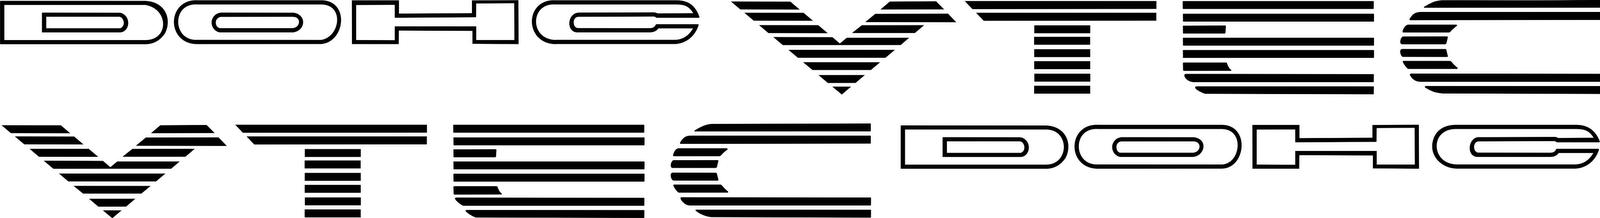 Pin Vtec-dohc-vector-logo on Pinterest  Honda